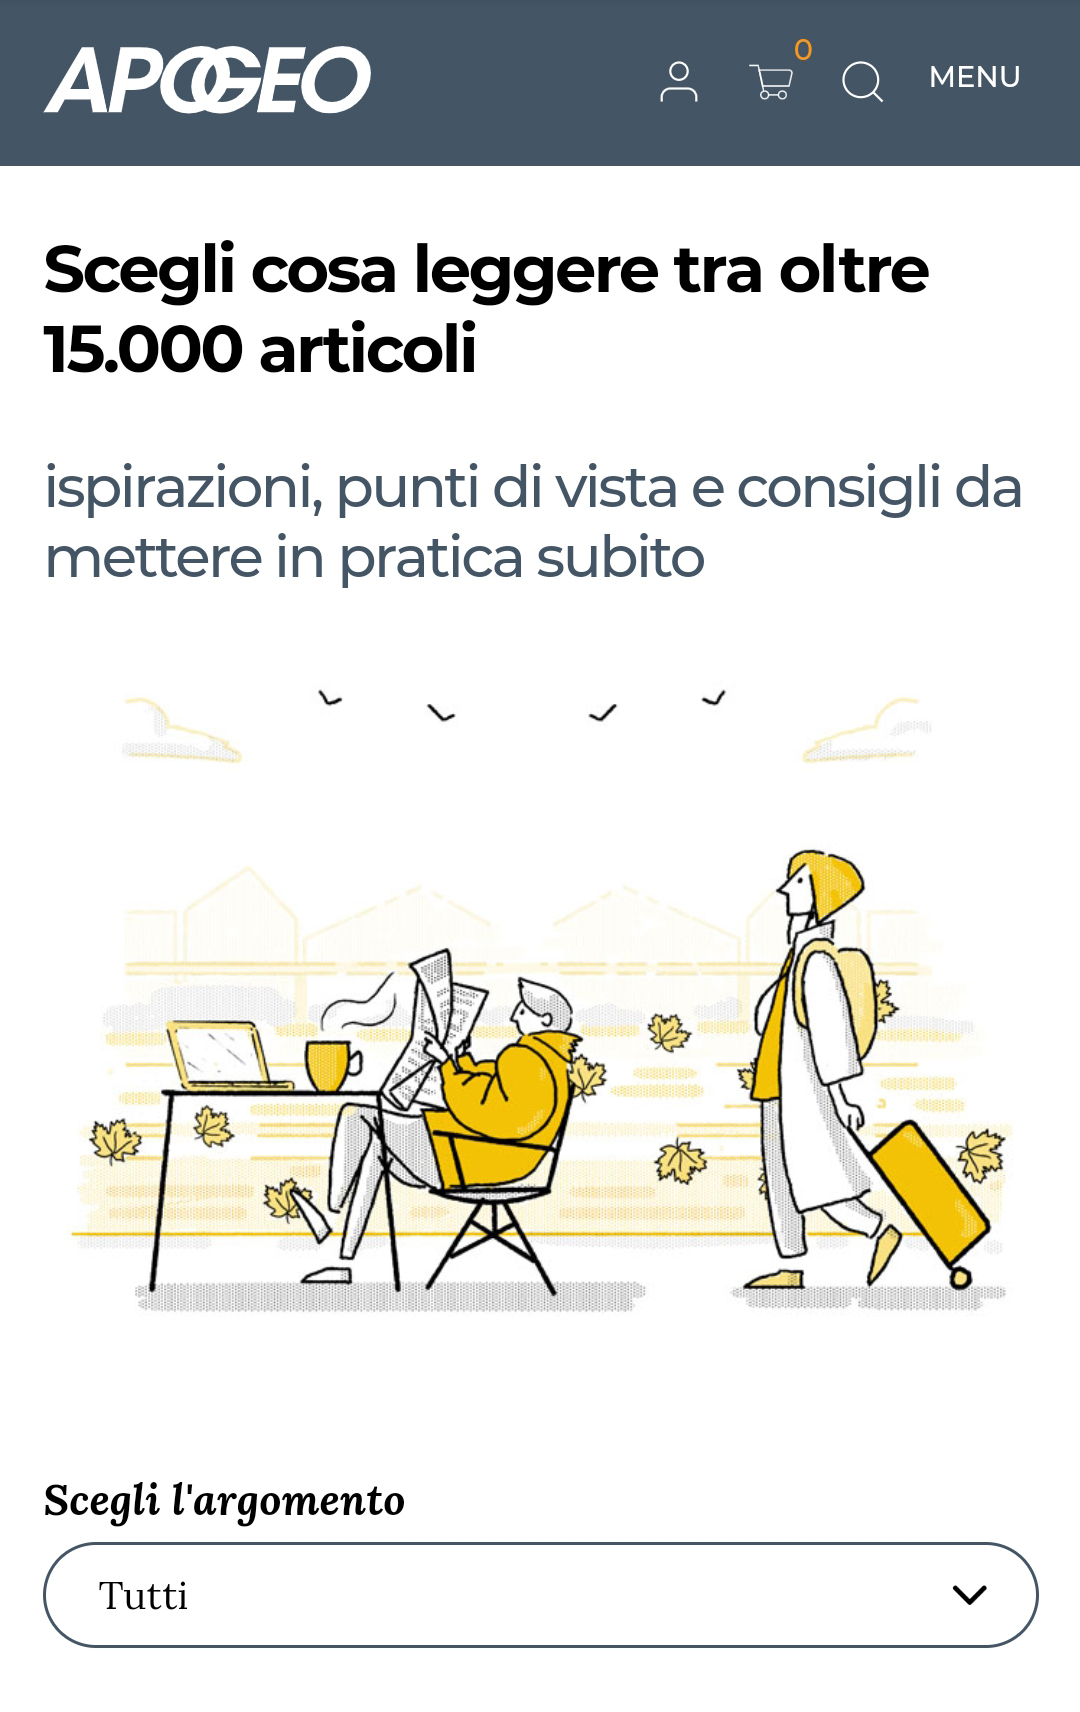 news-apogeo-website-illustration-roberta-ragona